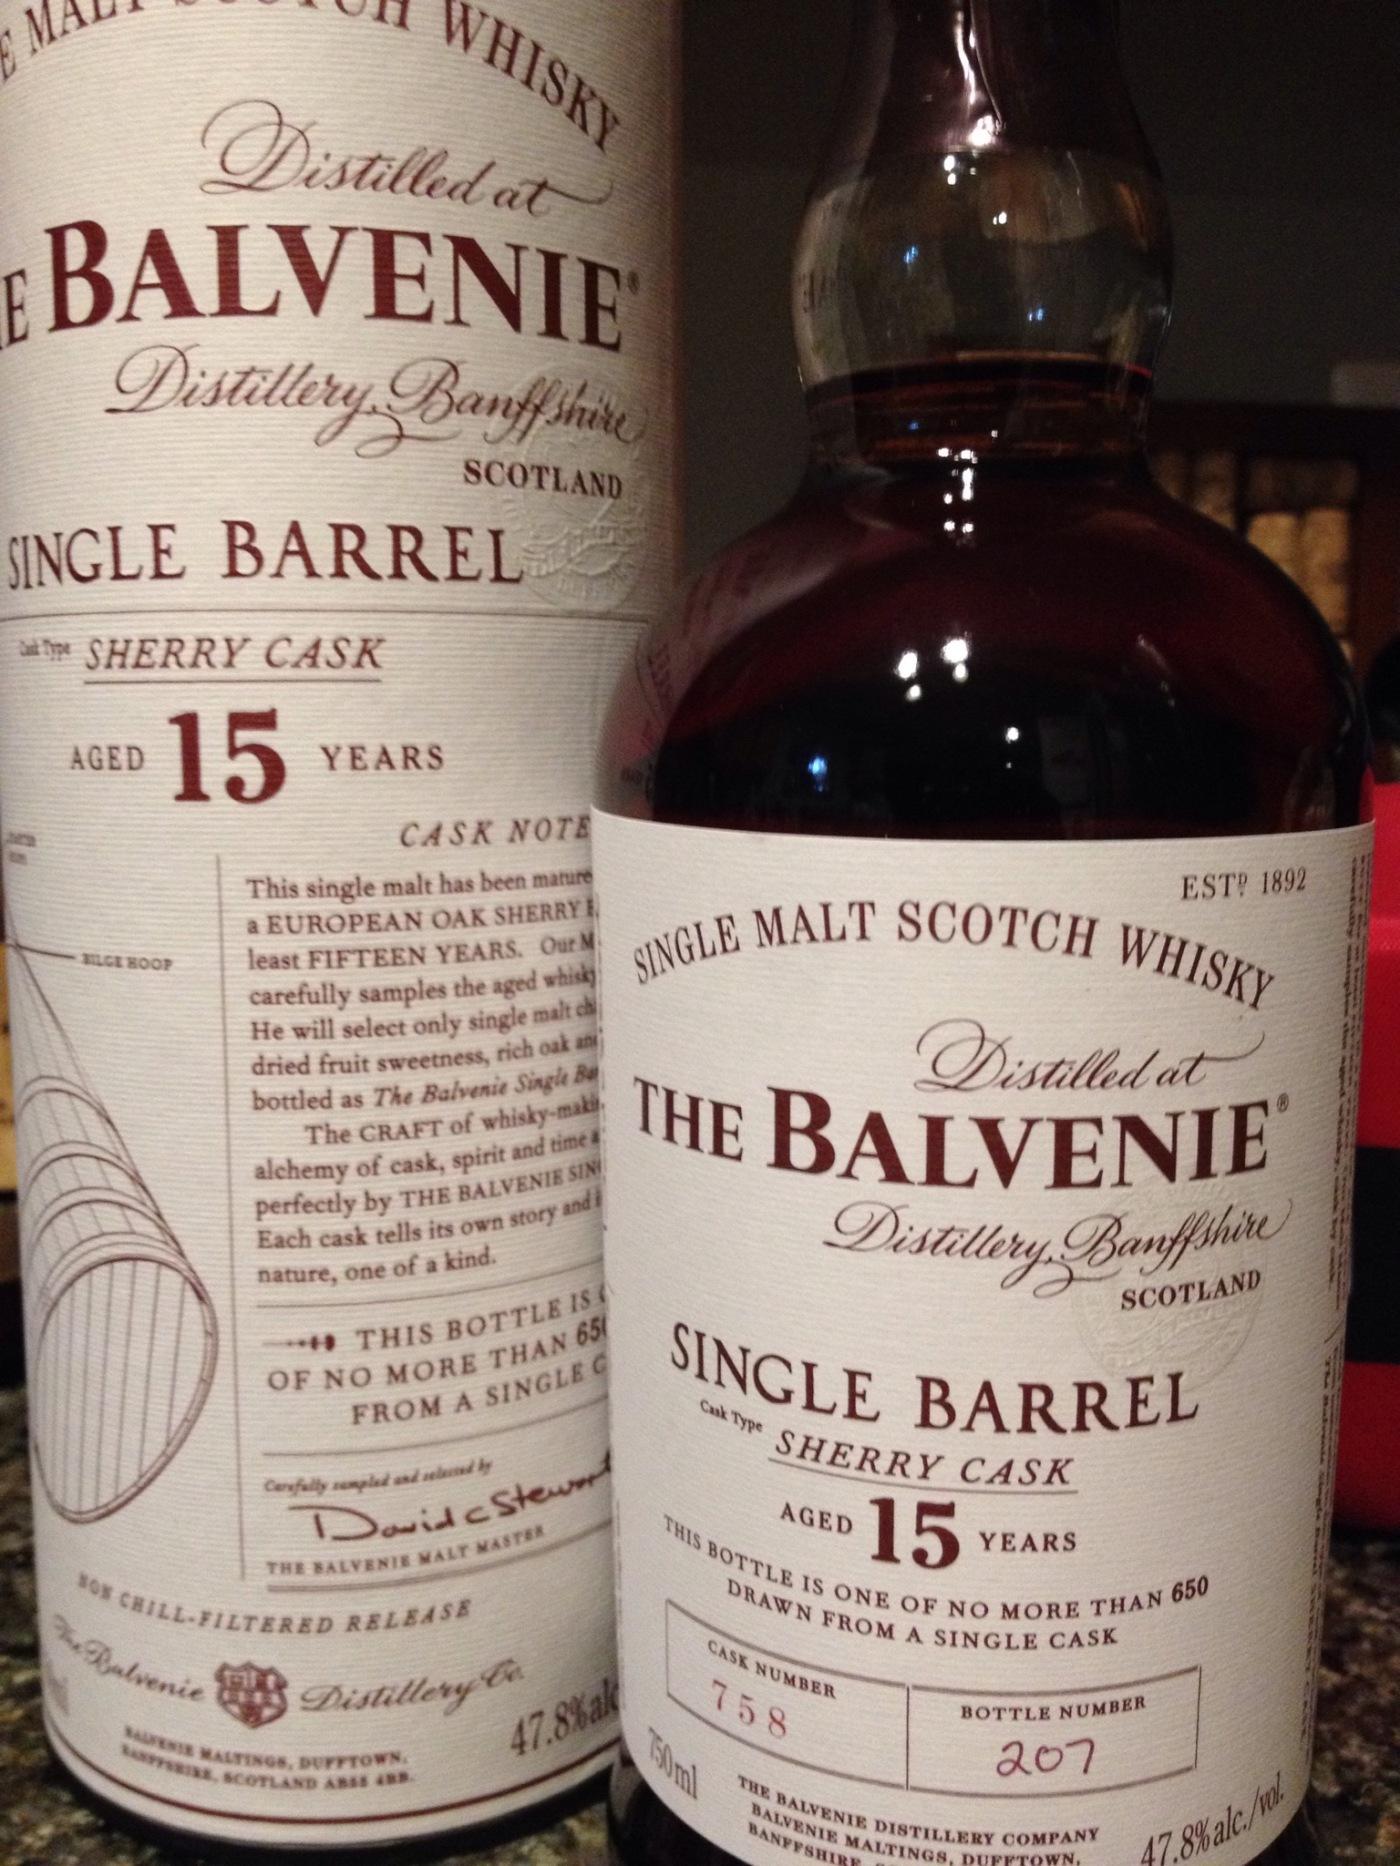 Balvenie 15 year Sherry Cask